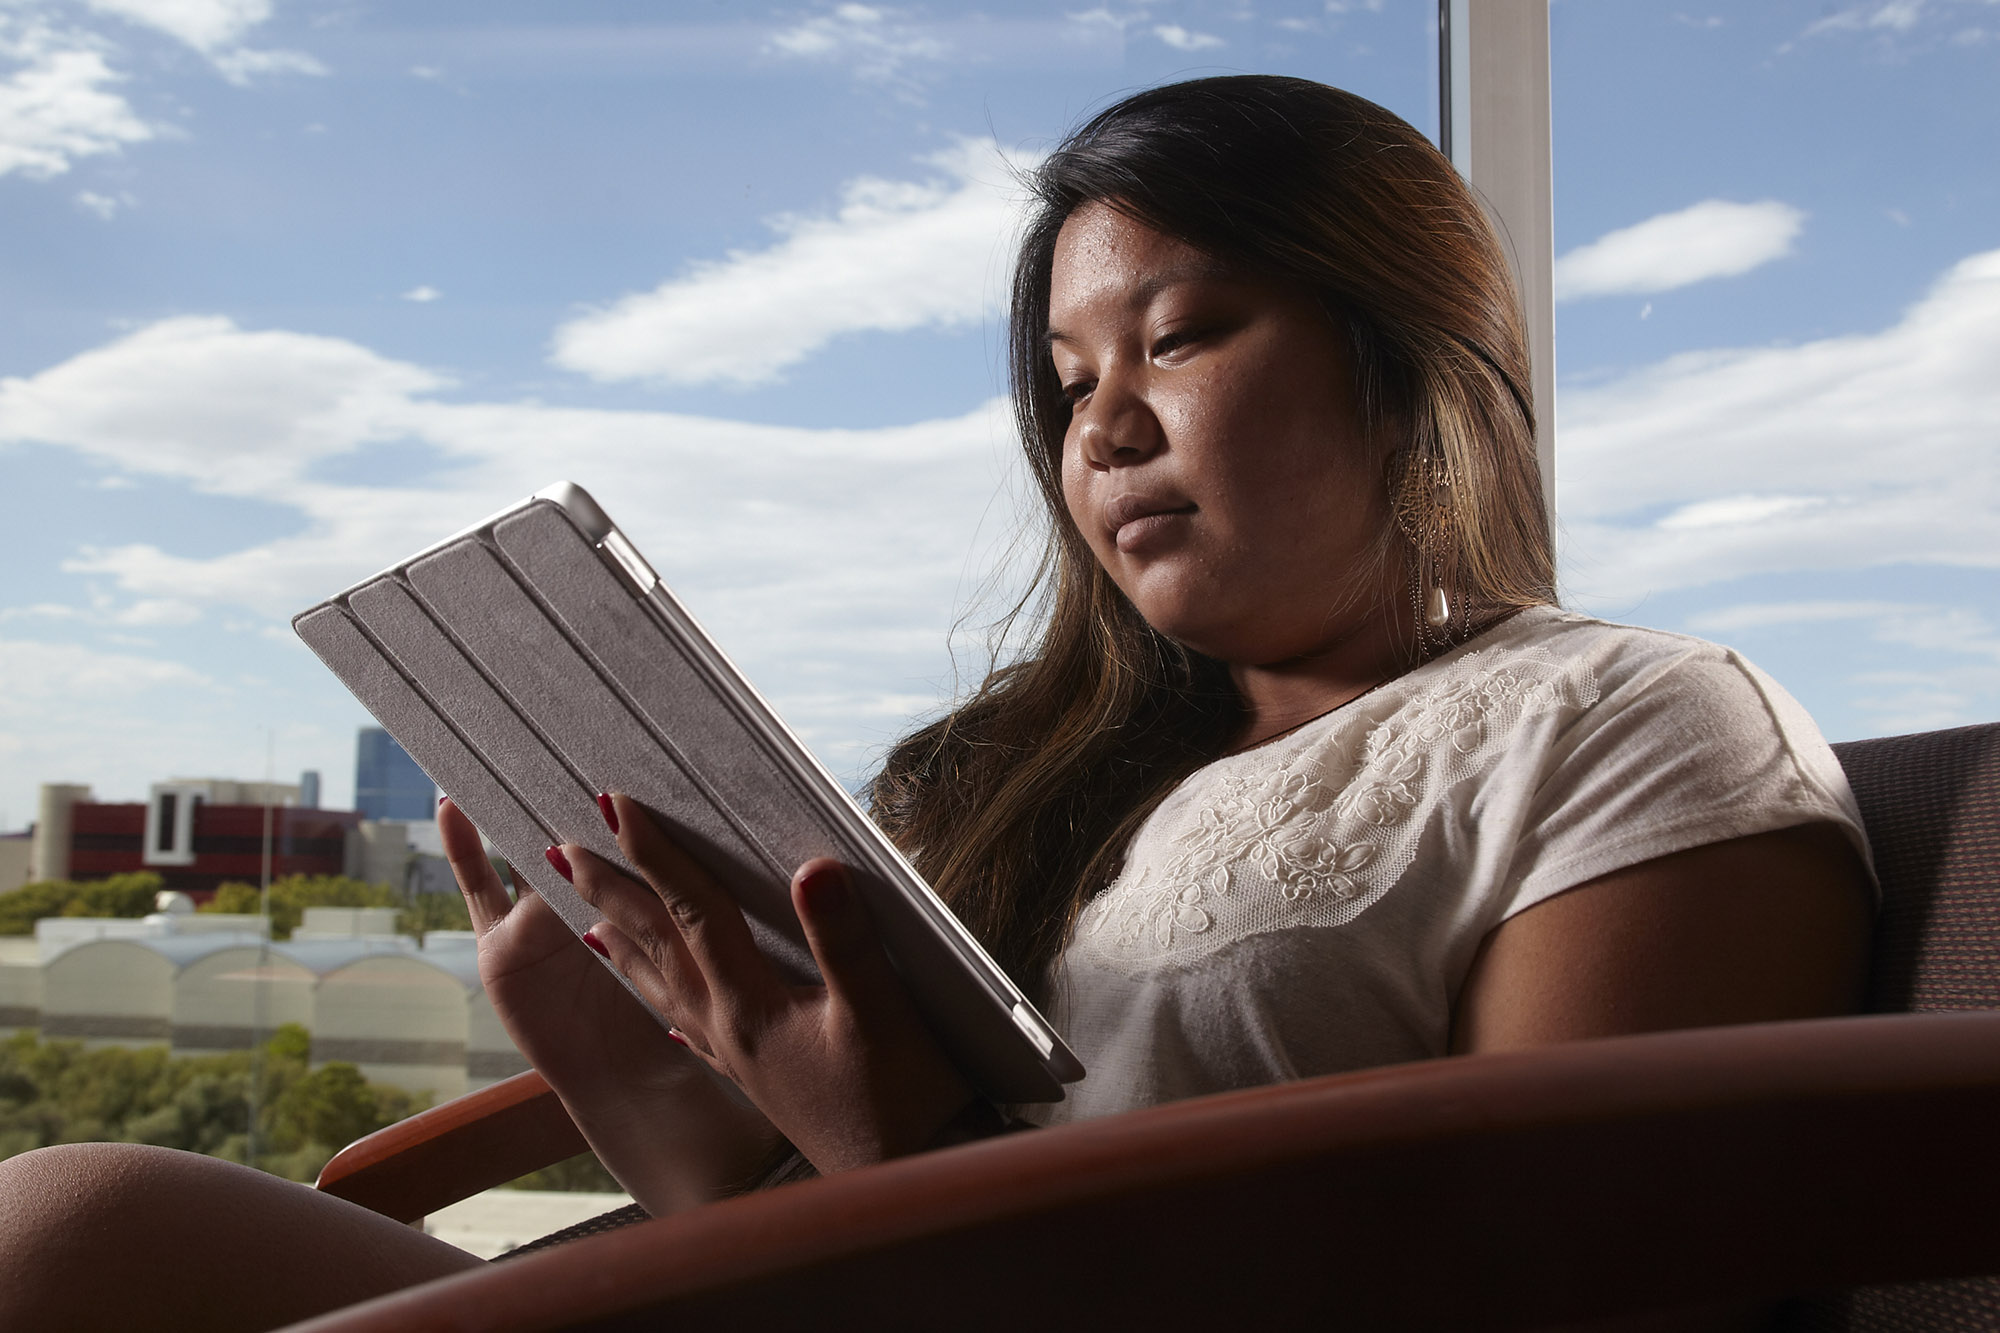 What A Pain Ipad Neck Plagues Women More News Center University Of Nevada Las Vegas Unlv bookstore, las vegas, nevada. what a pain ipad neck plagues women